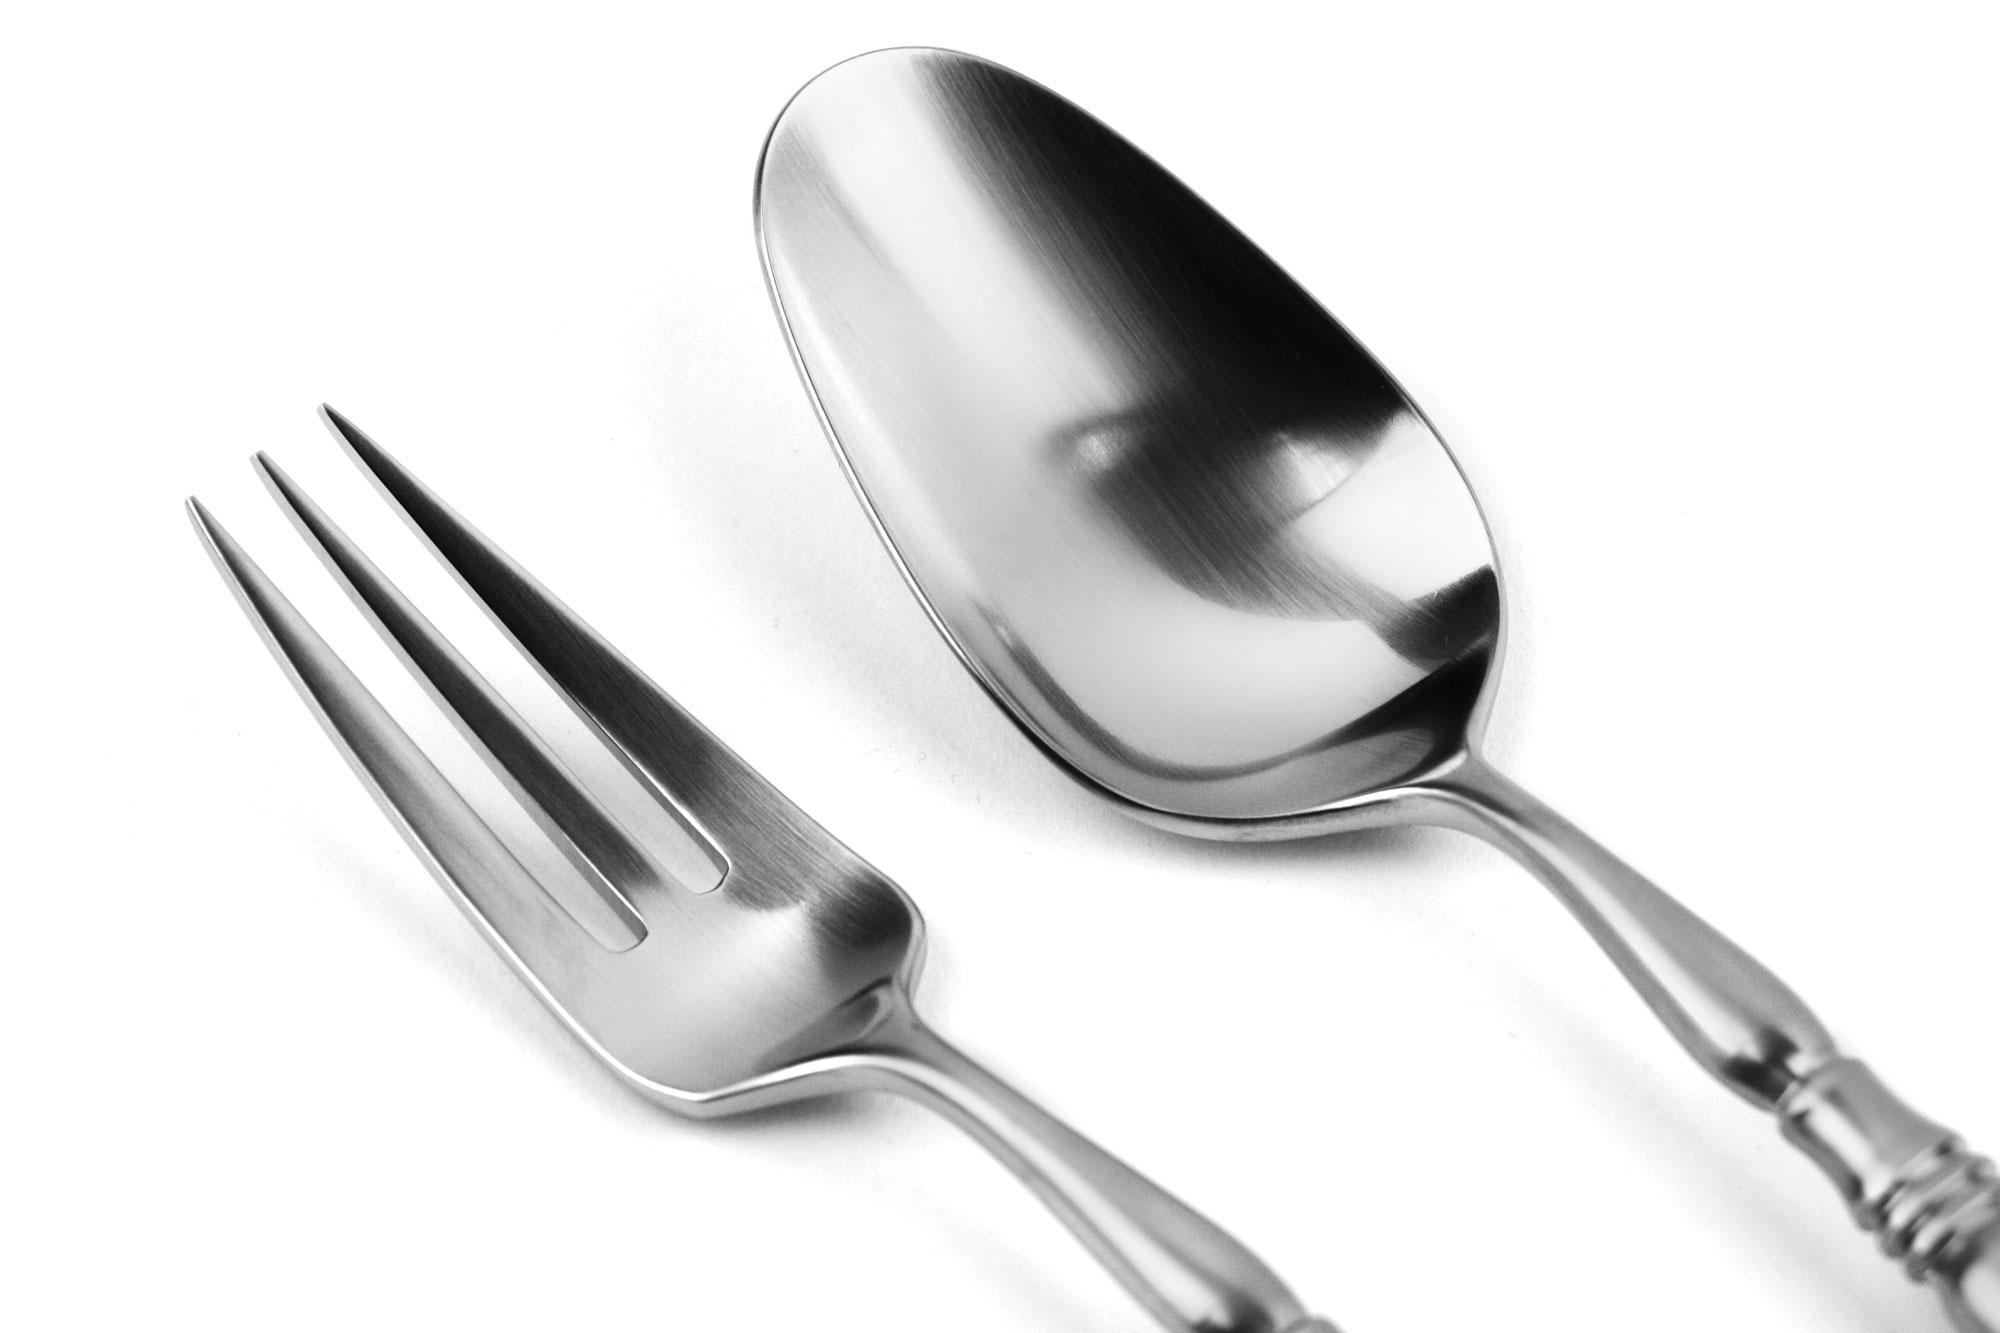 Yamazaki old denmark stainless steel flatware set 40 piece cutlery and more - Yamazaki stainless steel flatware ...